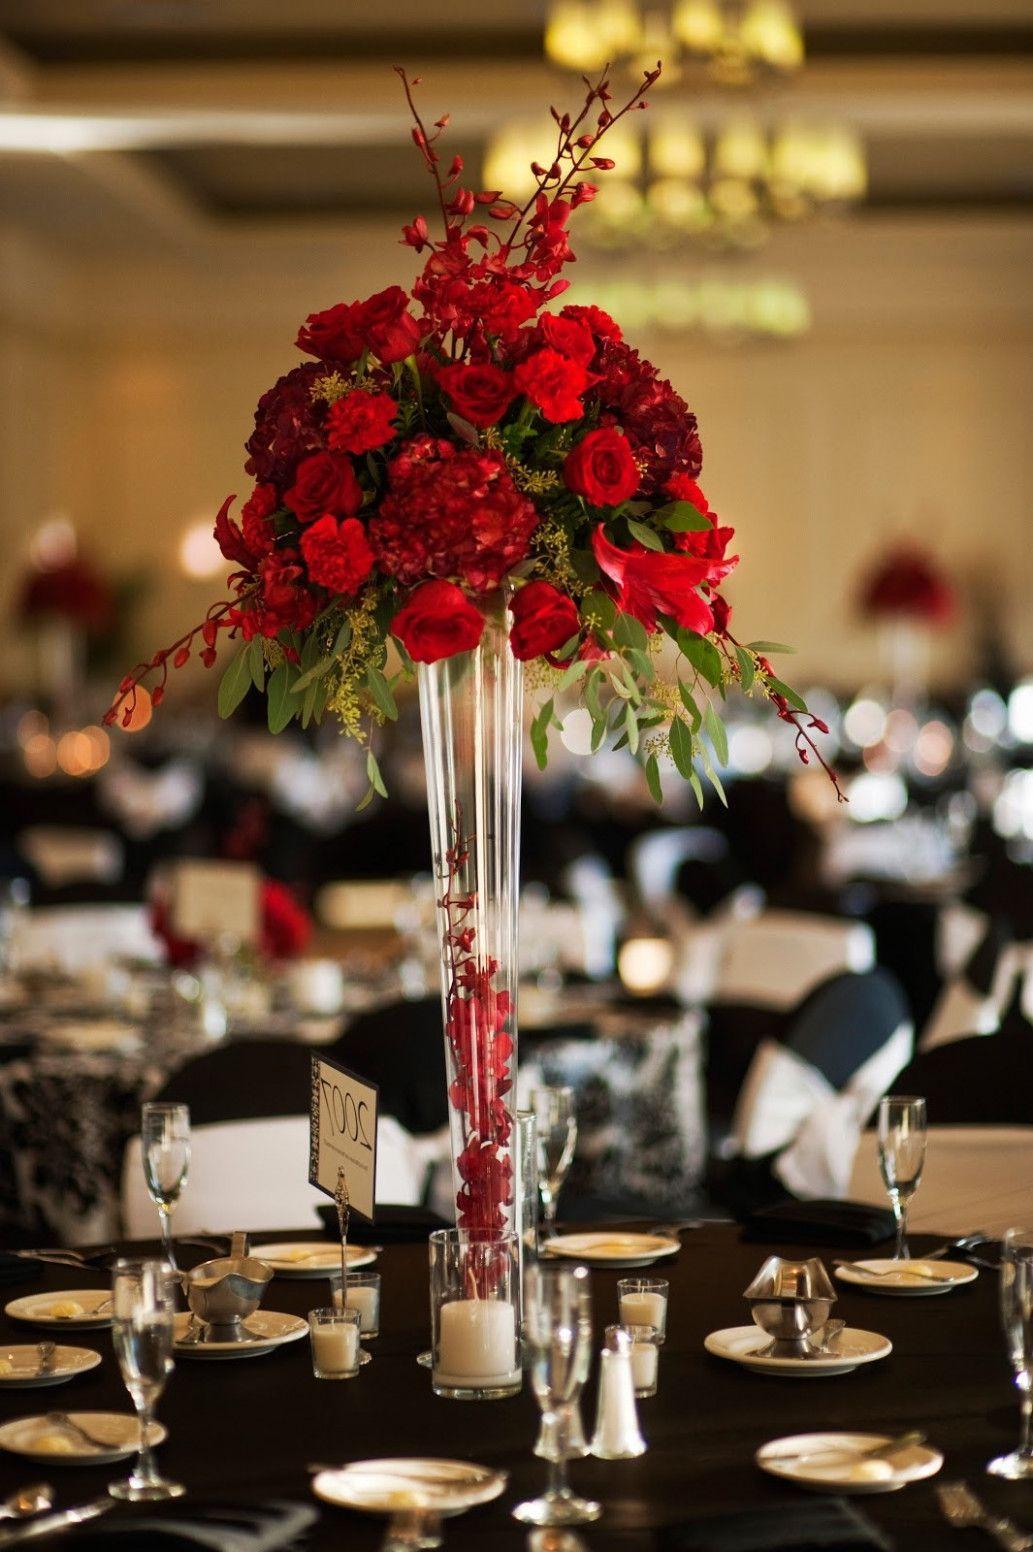 15 Romantic Red Wedding Centerpieces Ideas 19319 Centerpieces